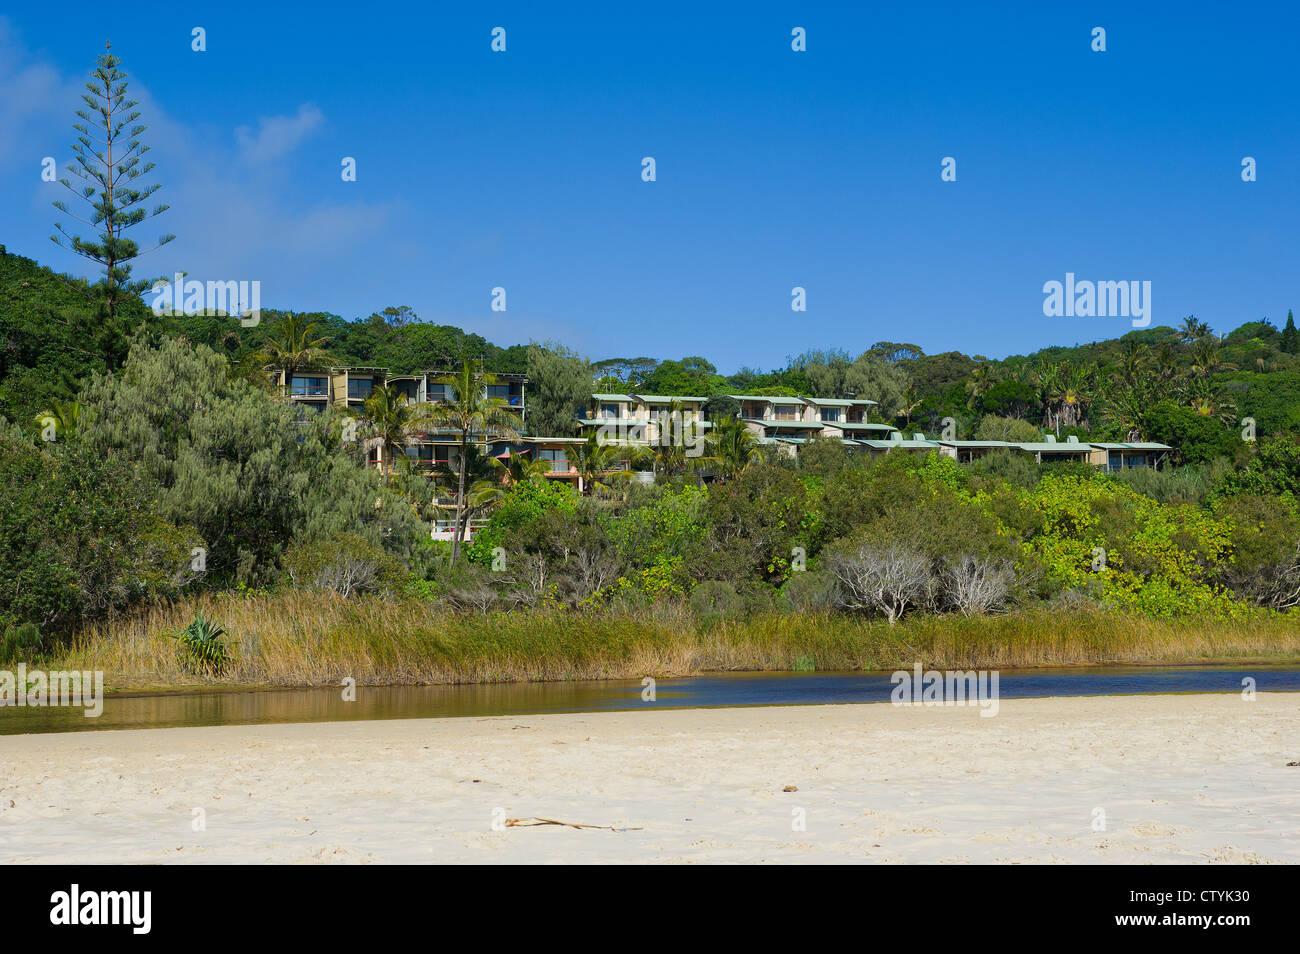 Apartments overlooking Cylinder Beach on Stradbroke Island in Queensland, Australia. Stock Photo